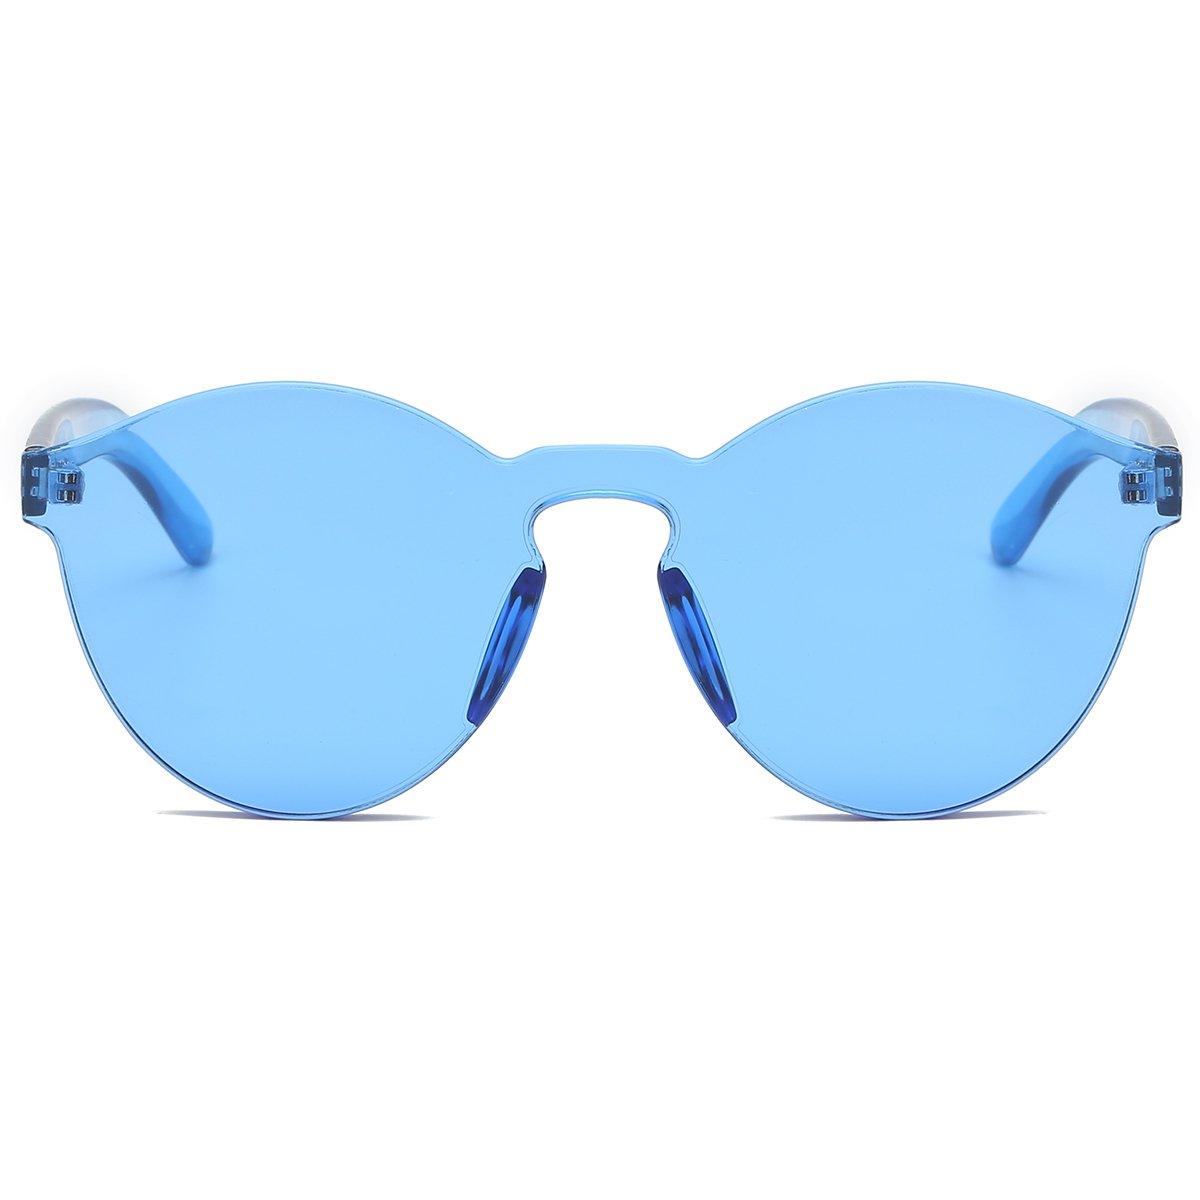 8109d5df20 LKEYE-Fashion Party Rimless Sunglasses Transparent Candy Color Eyewear  LK1737